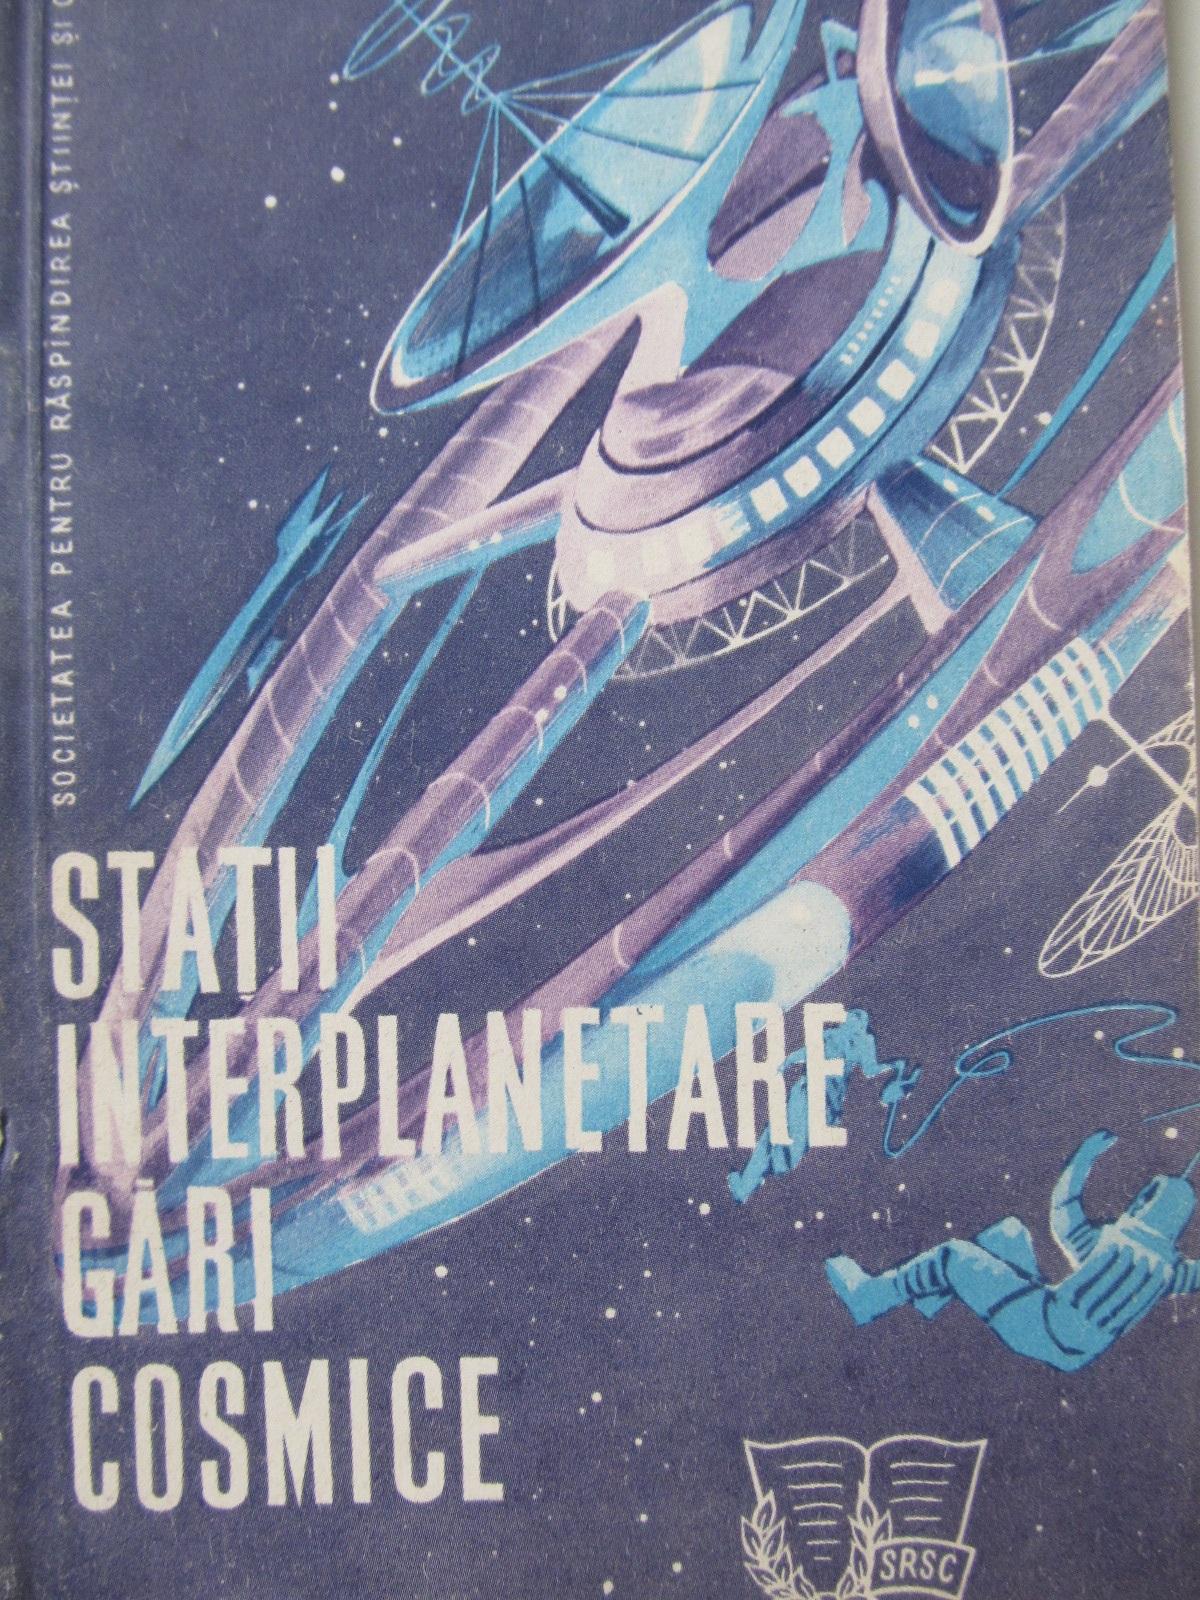 Statii interplanetare gari cosmice - I. Pascaru ... | Detalii carte